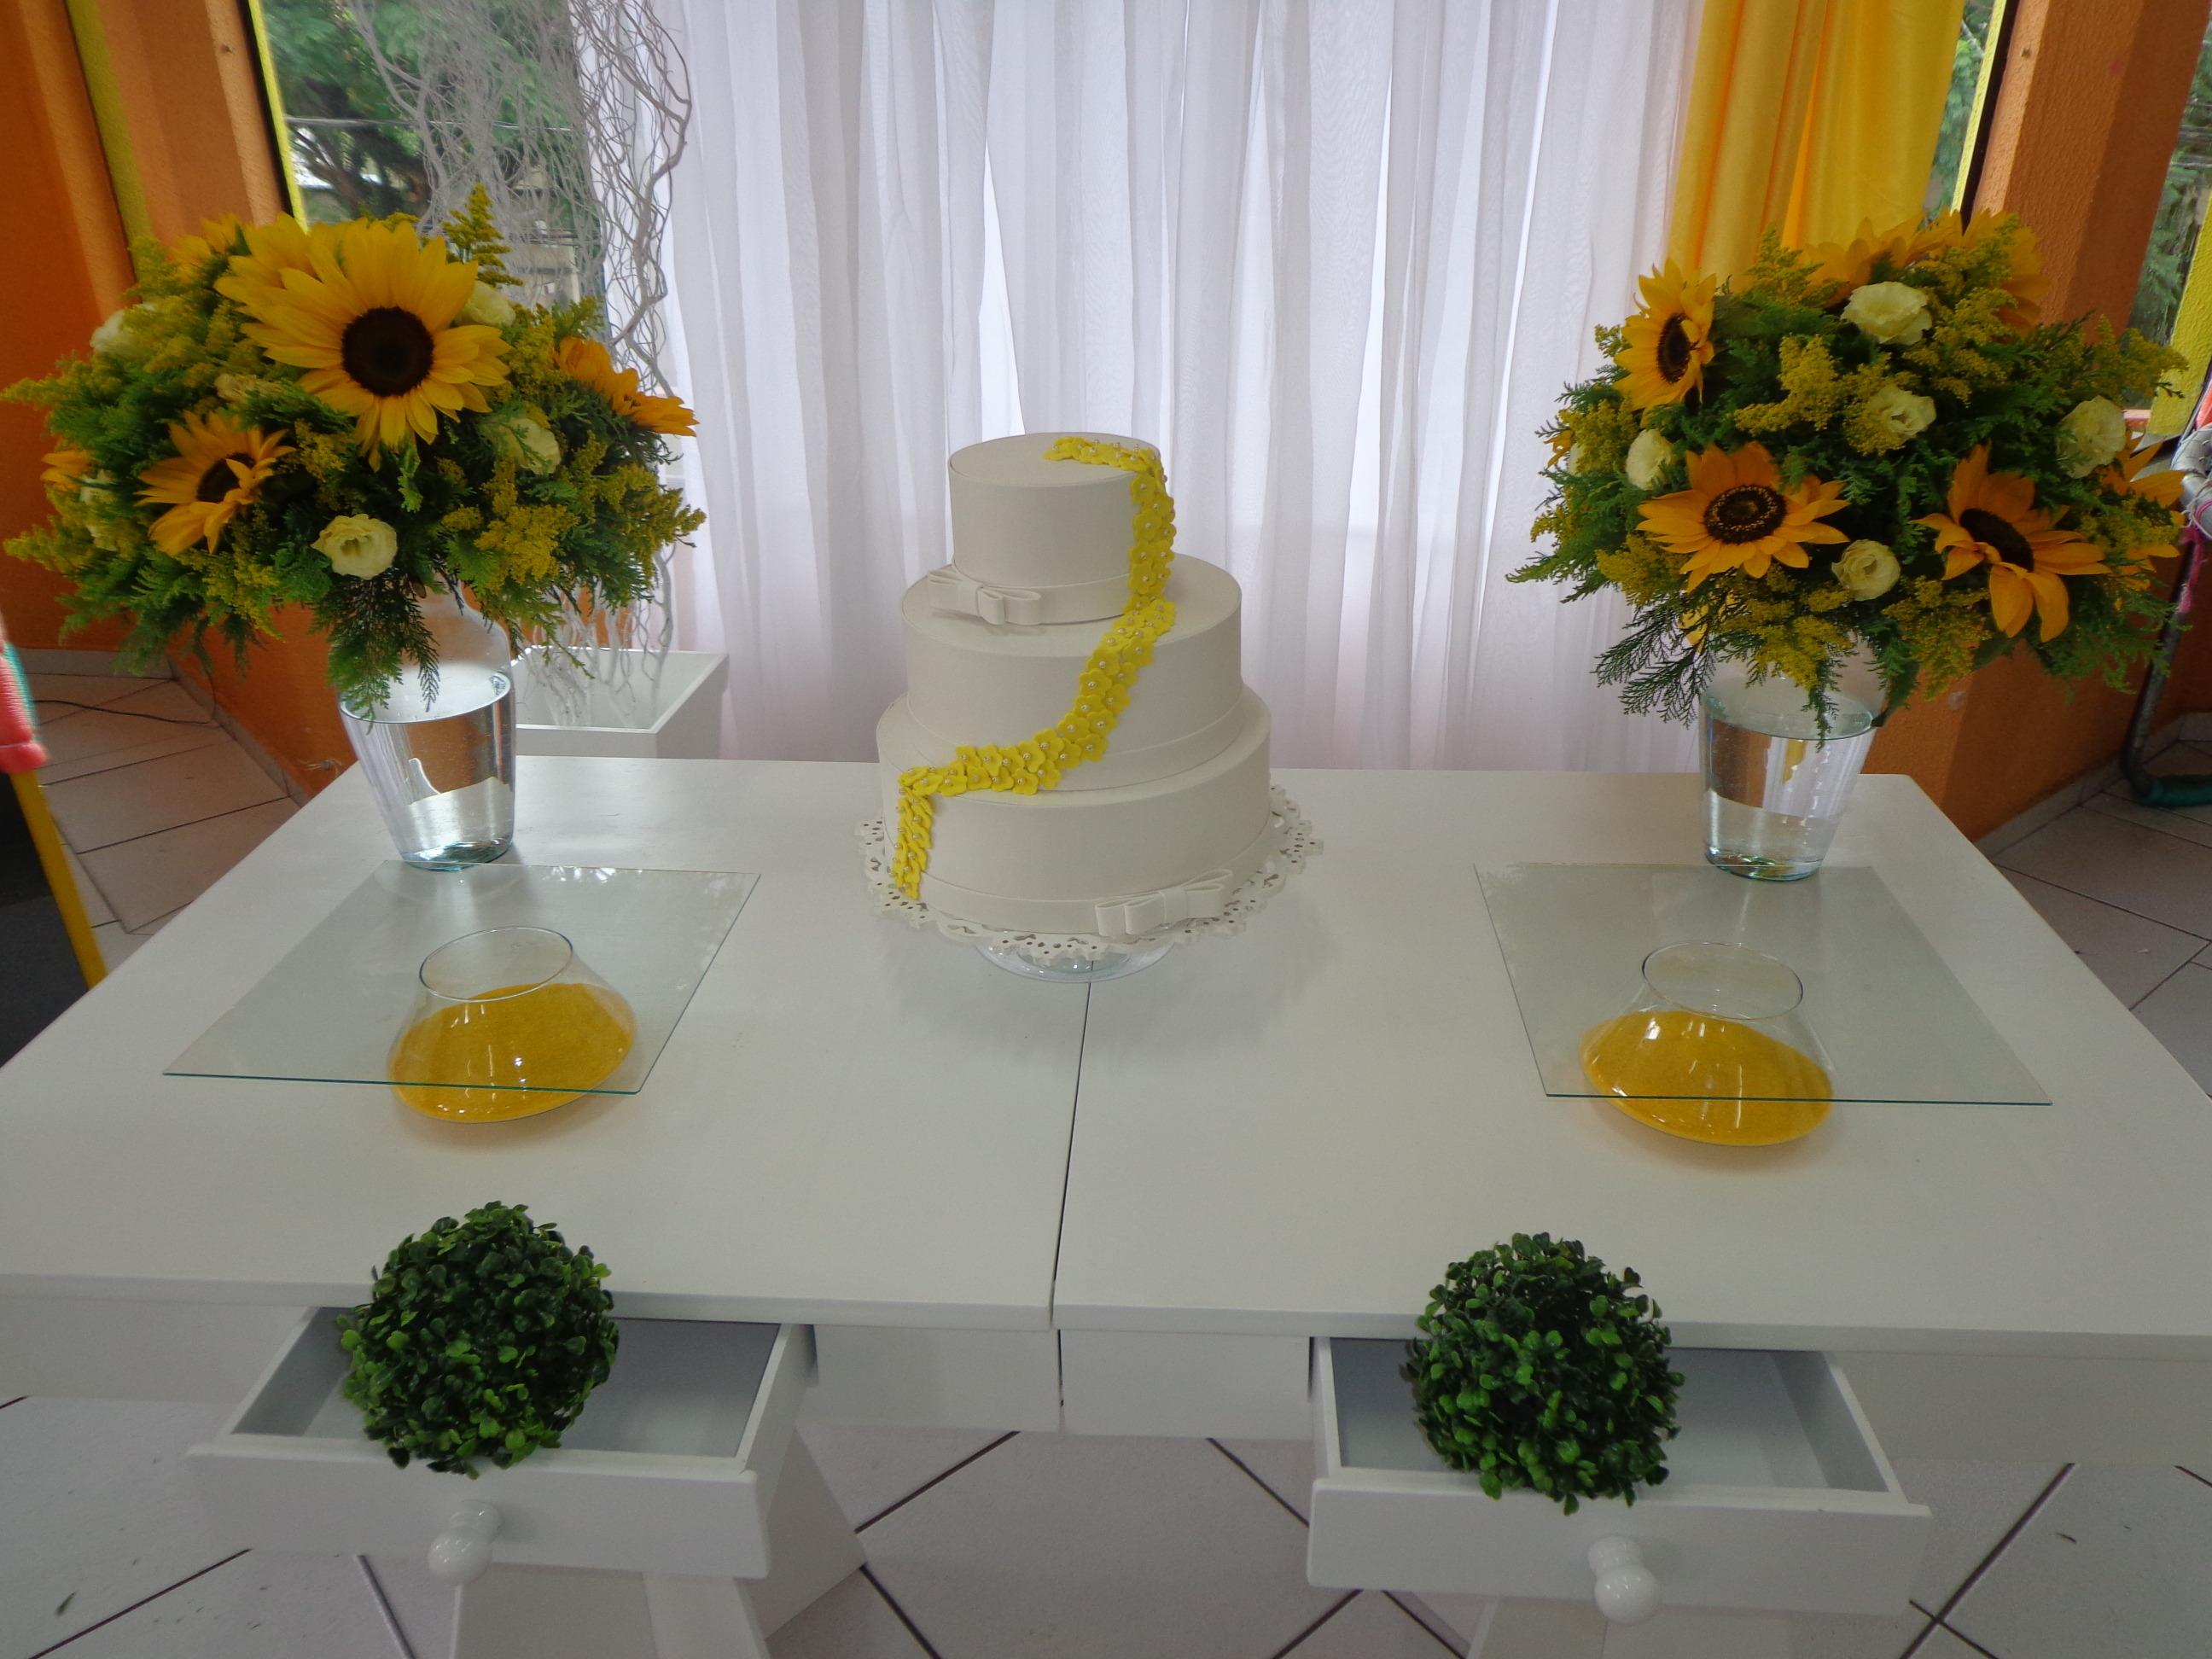 kit decoracao casamento:kit provencal casamento aluguel kit provencal casamento aluguel kit